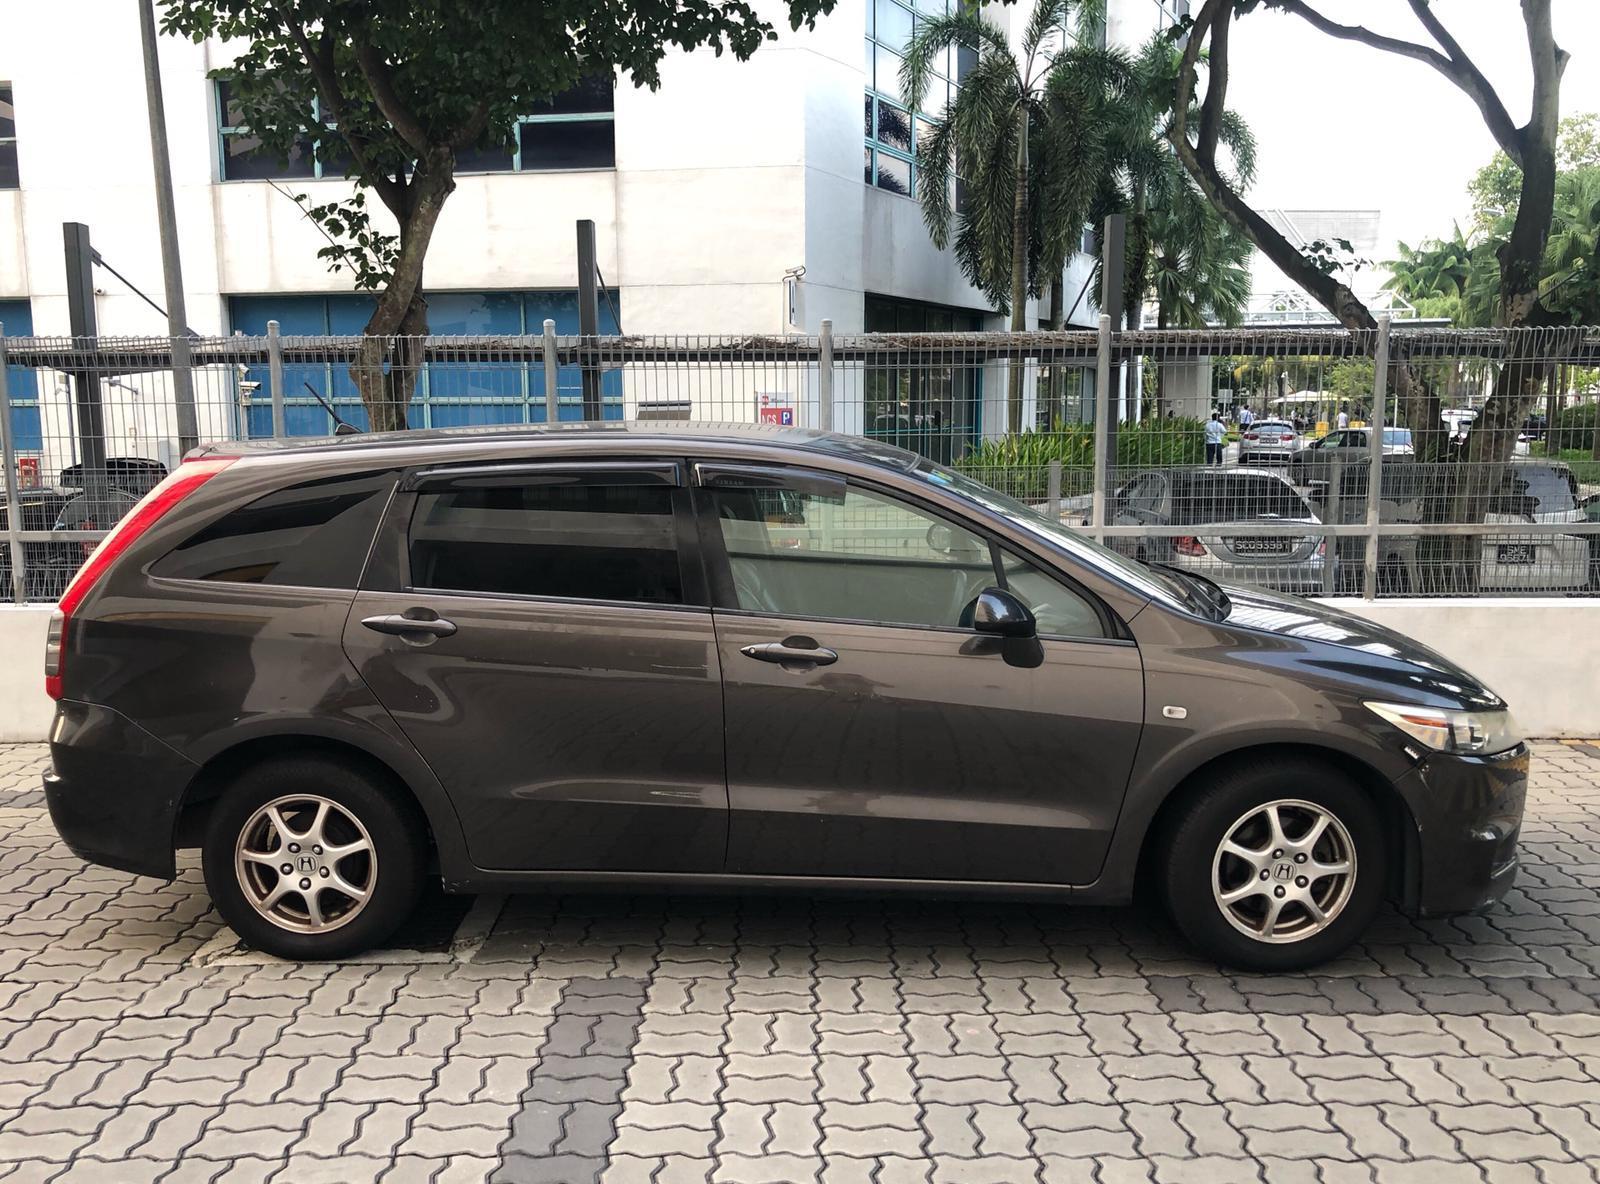 HONDA STREAM 1.8a  mpv 6-7 seater Car rent cheapest for PHV grab gojek personal.